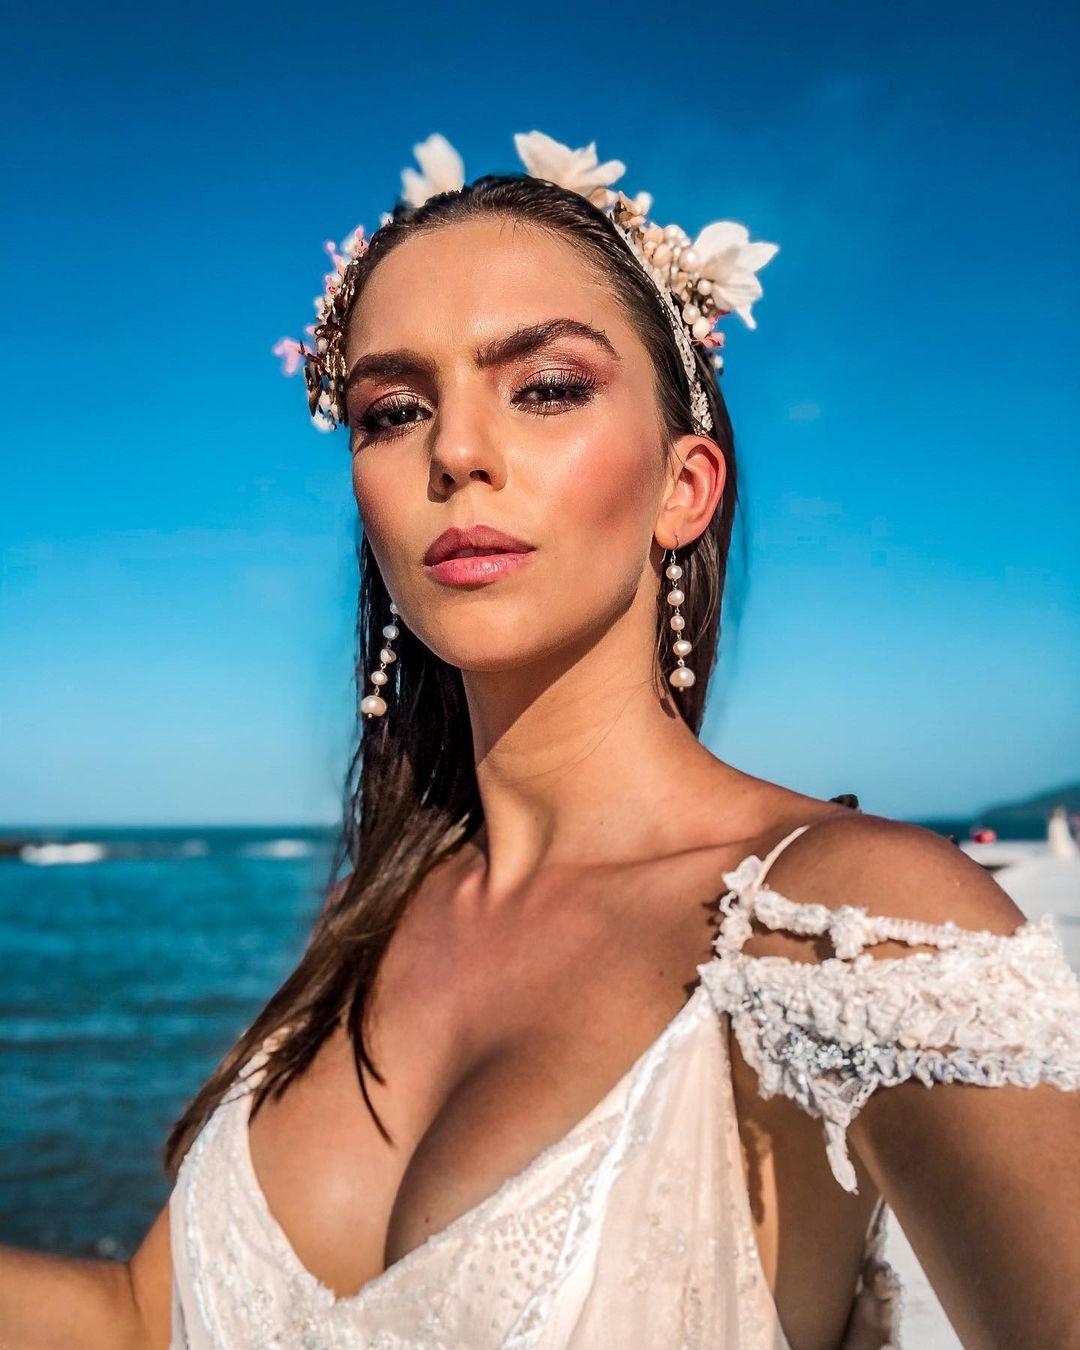 ana flavia giacomini, miss ilha dos lobos mundo 2019. - Página 2 Fvo6yu10